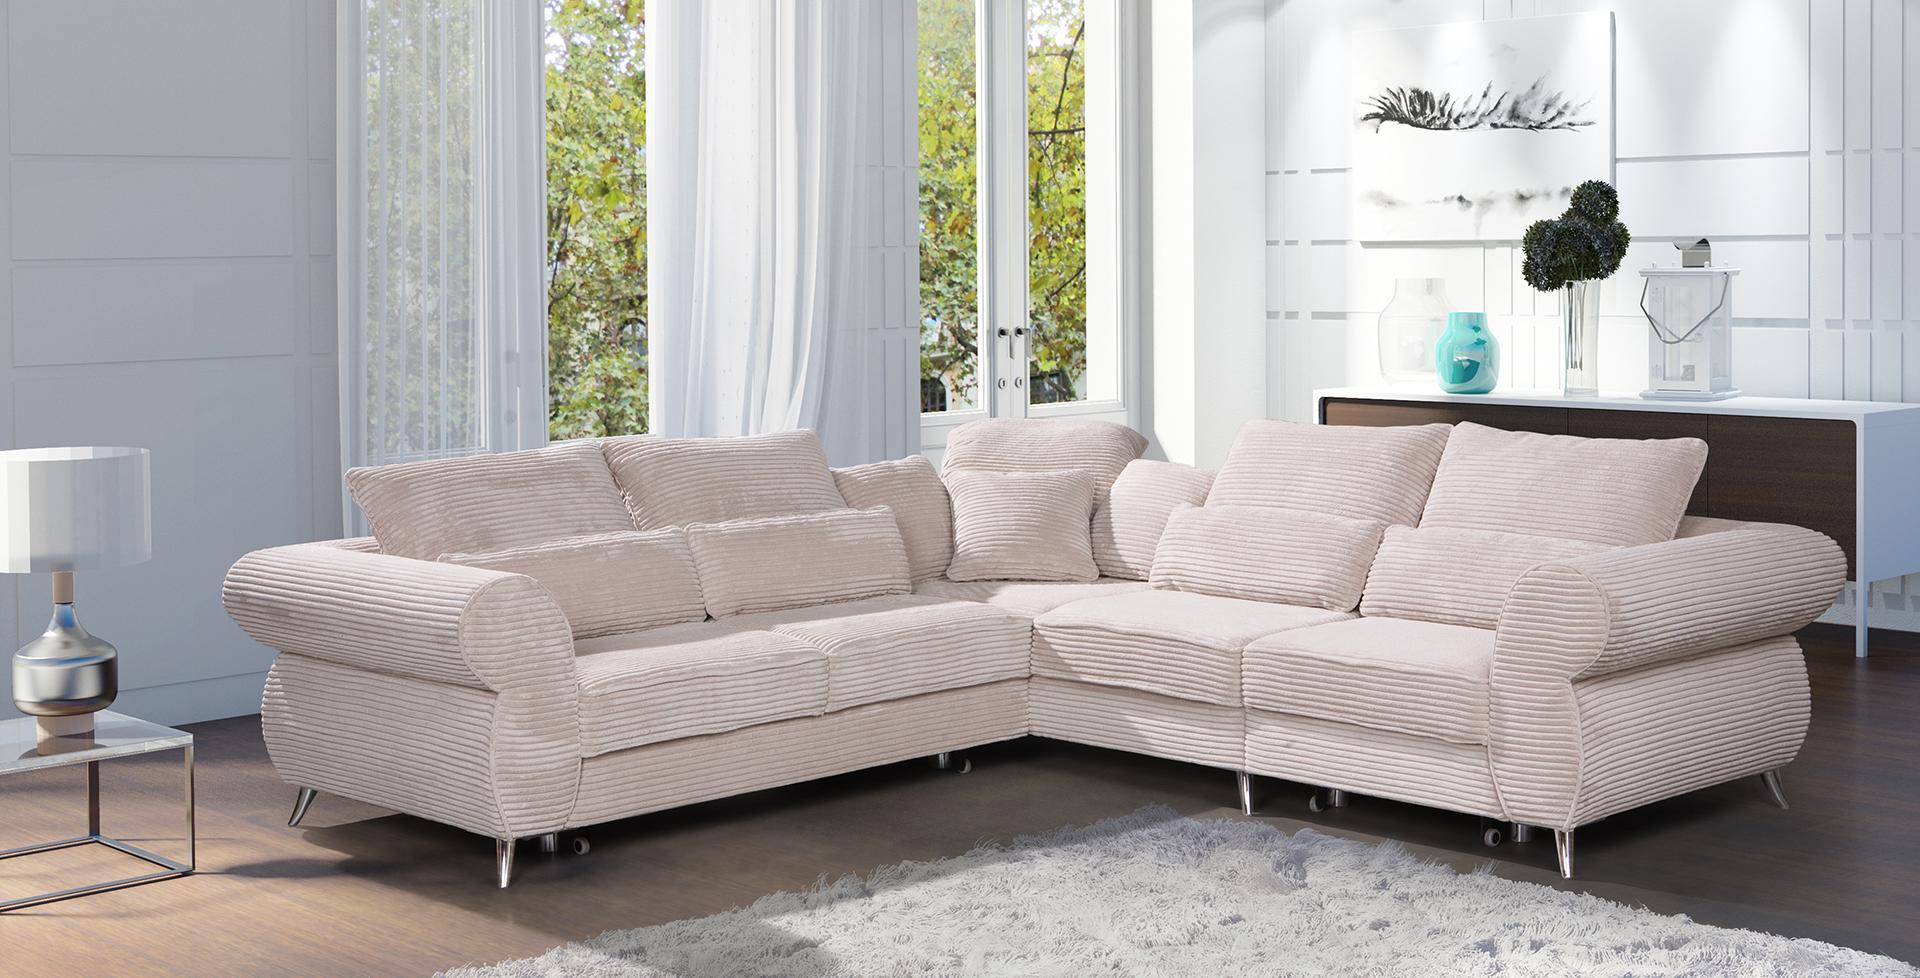 Sofa schlafsofa designer sofa mit bettfunktion for Schlafsofa mit bettfunktion